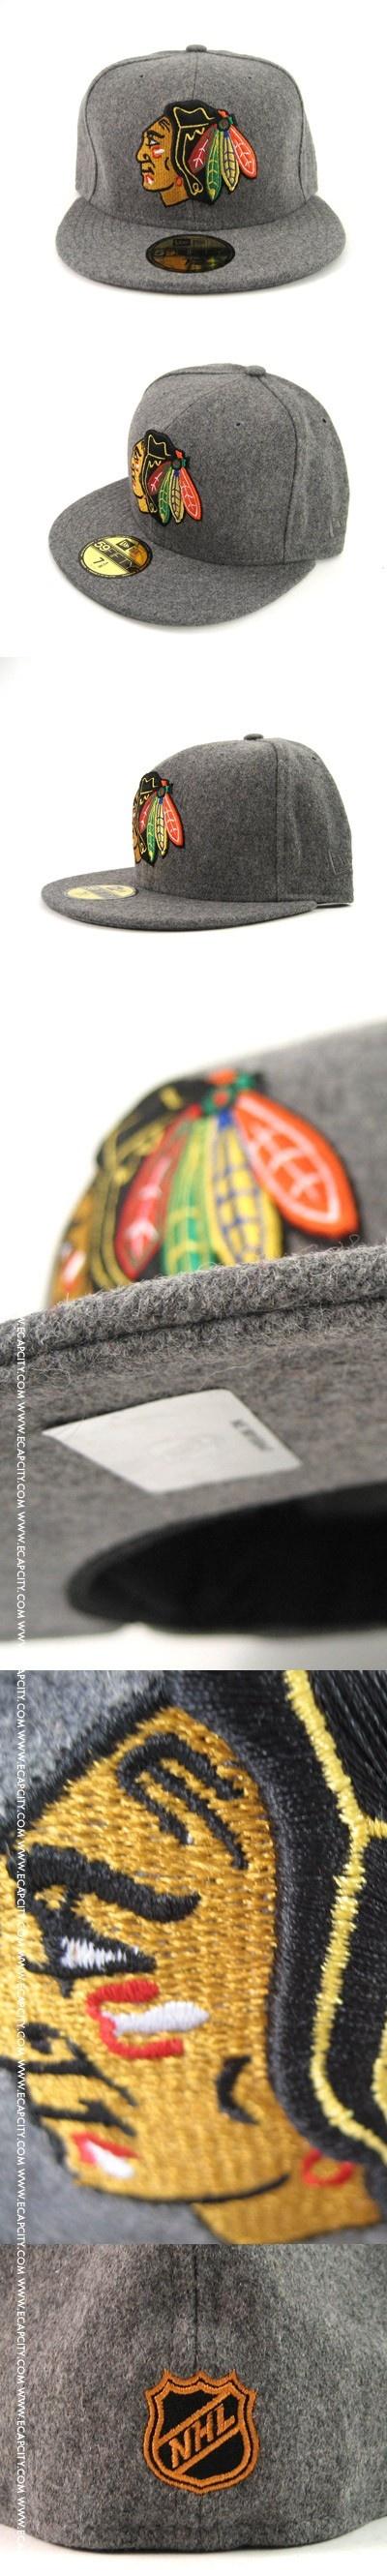 Chicago Blackhawks New Era Hats (WOOL FLANNEL) – Custom Fitteds – NHL 59Fifty Caps